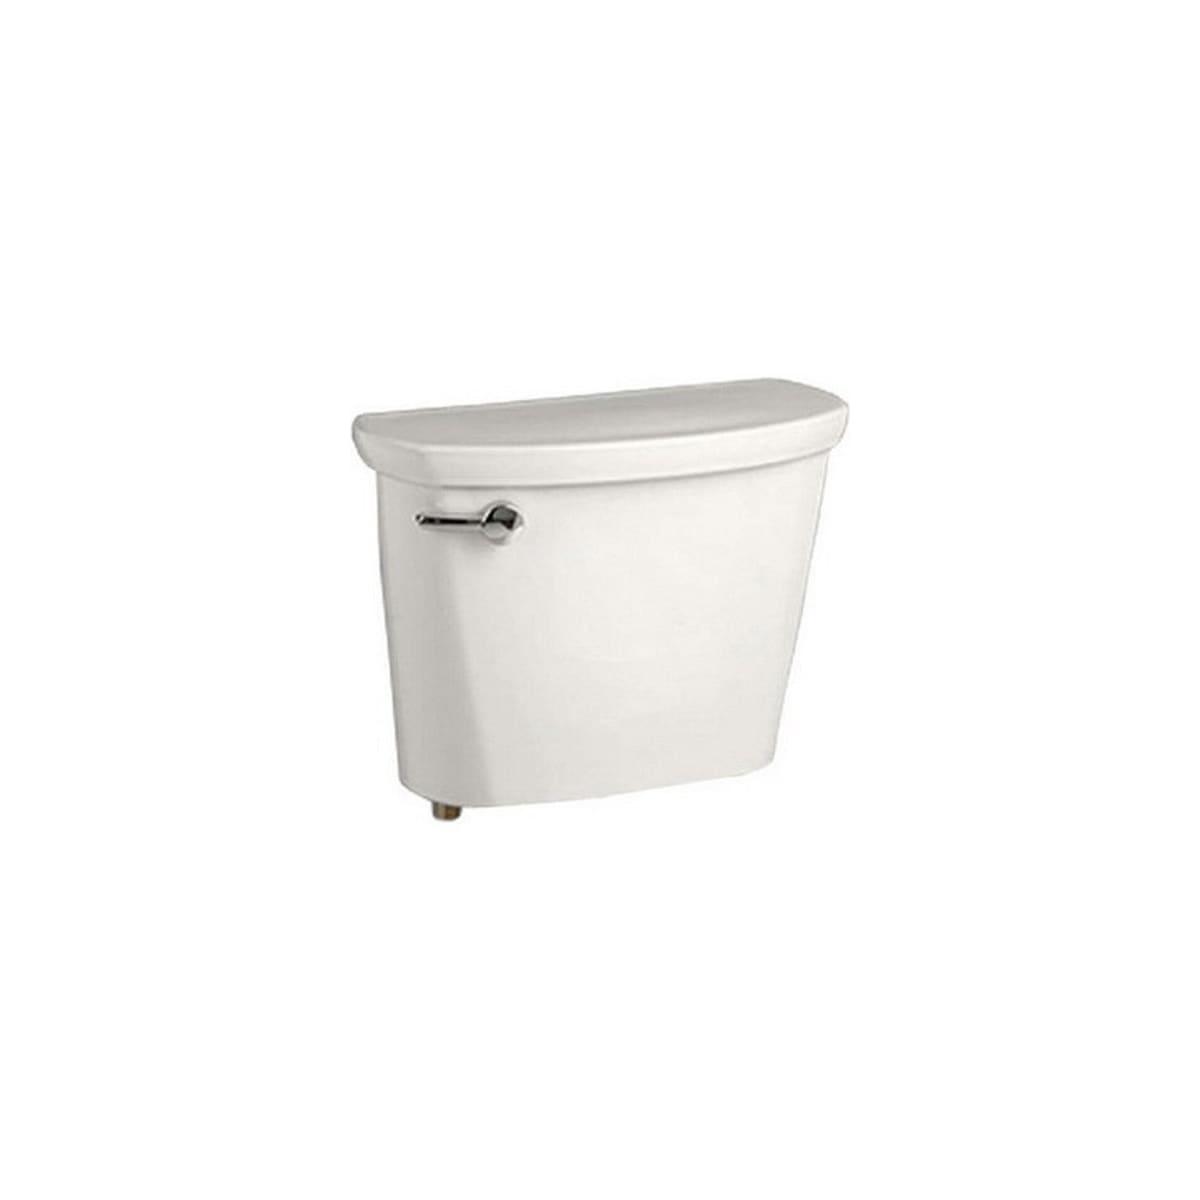 American Standard 4188A.104.020 White Cadet Pro 1.28 GPF Toilet Tank ...